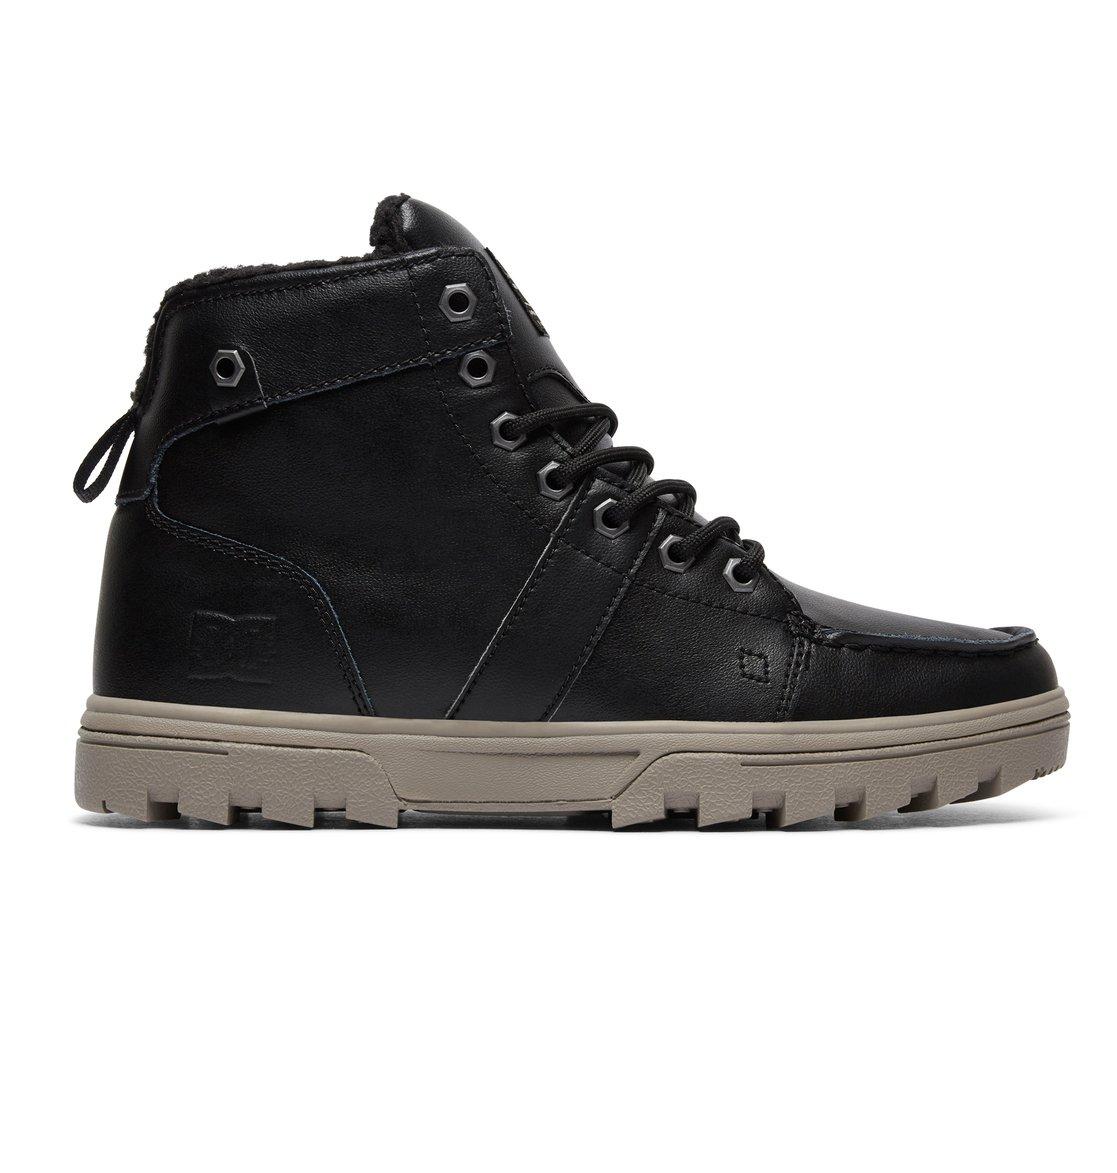 Mens DC Men's Notch 2 Skate Shoe Hot Sale Size 43